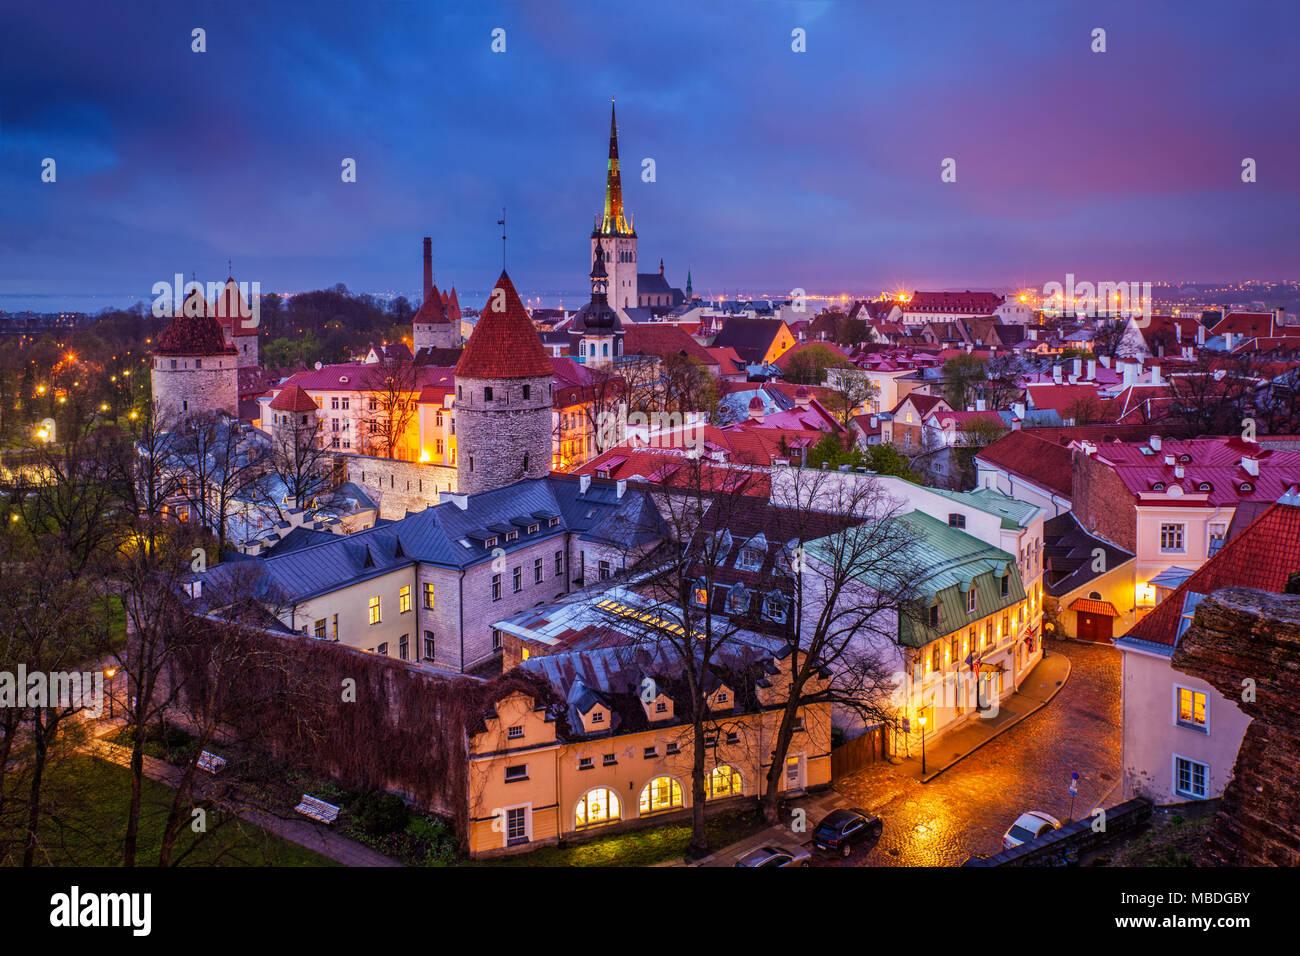 Tallinn Medieval Old Town, Estonia - Stock Image